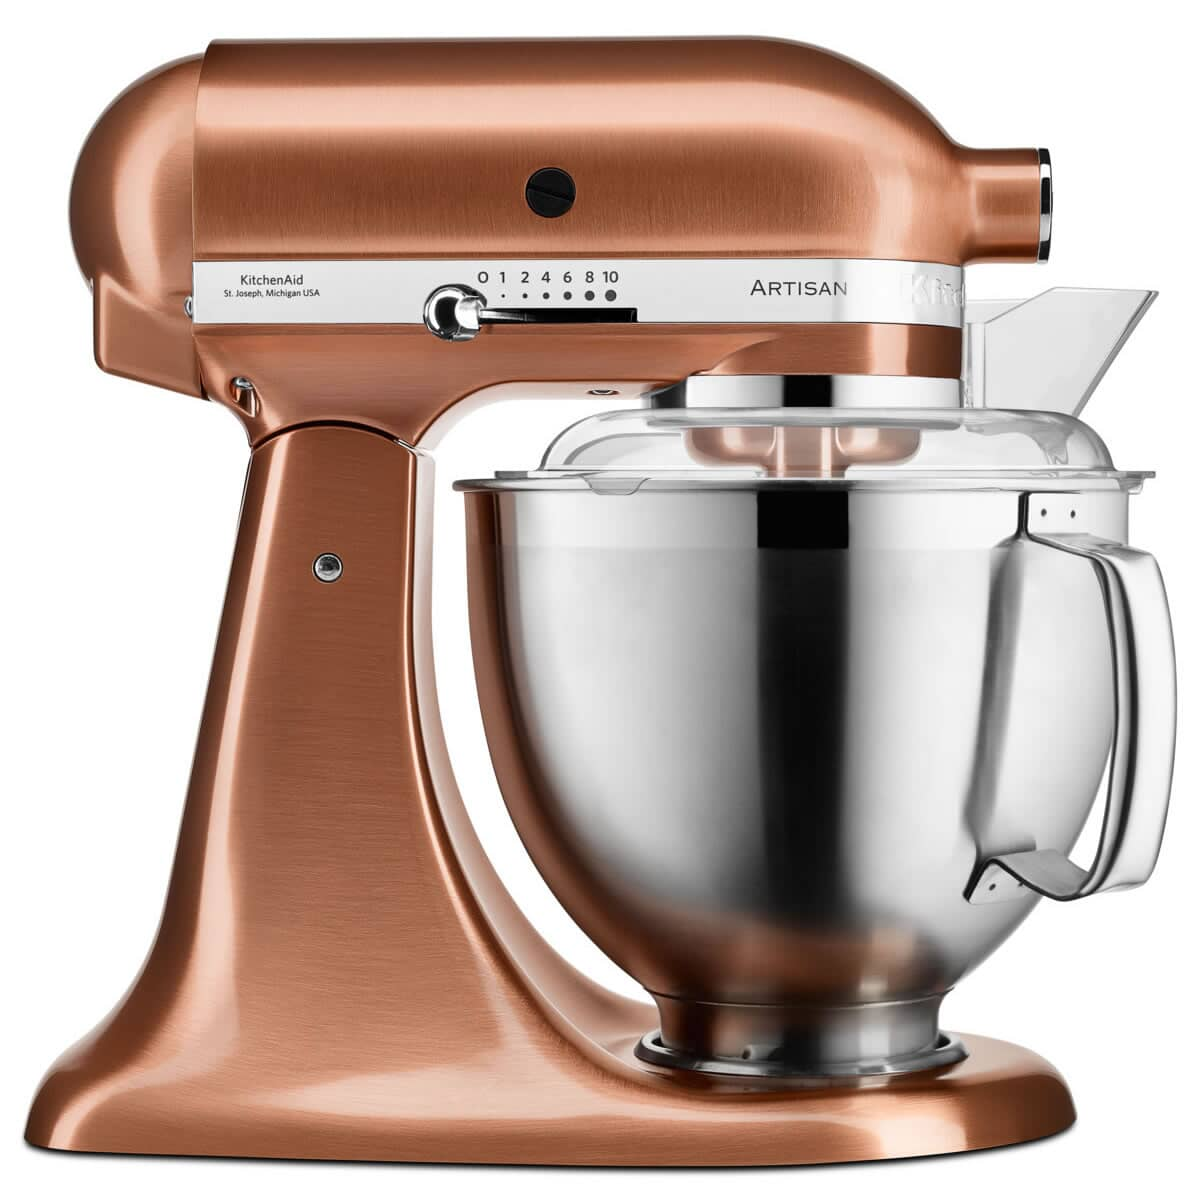 Kitchenaid Artisan Mixer 4 8l Copper 5ksm185psbcp